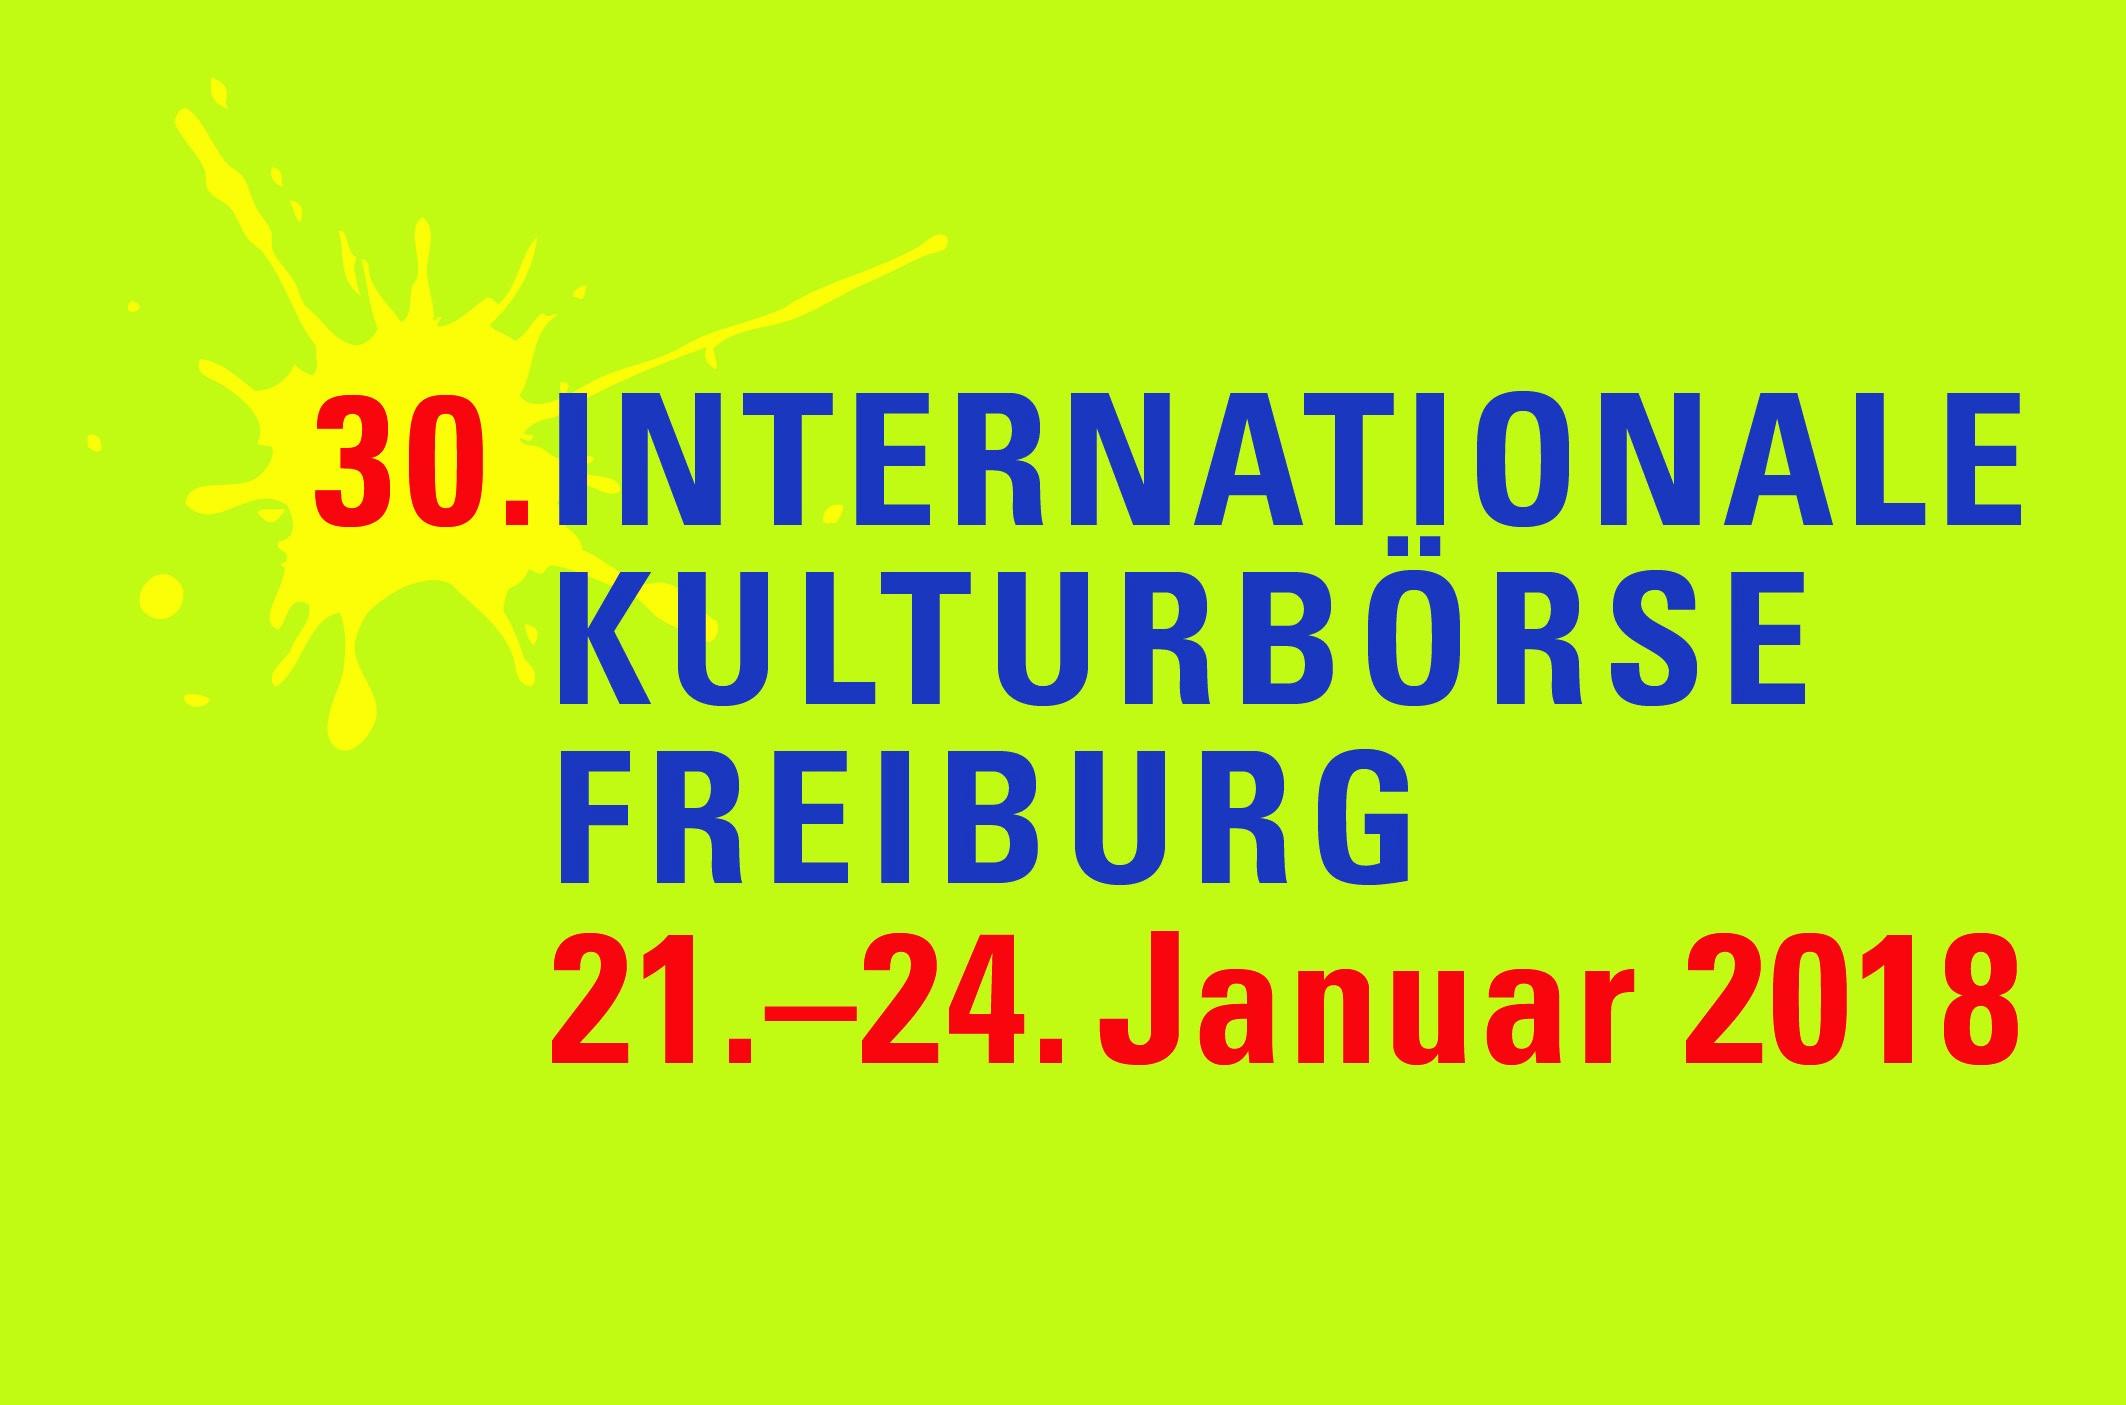 kulturboerse-freiburg.de